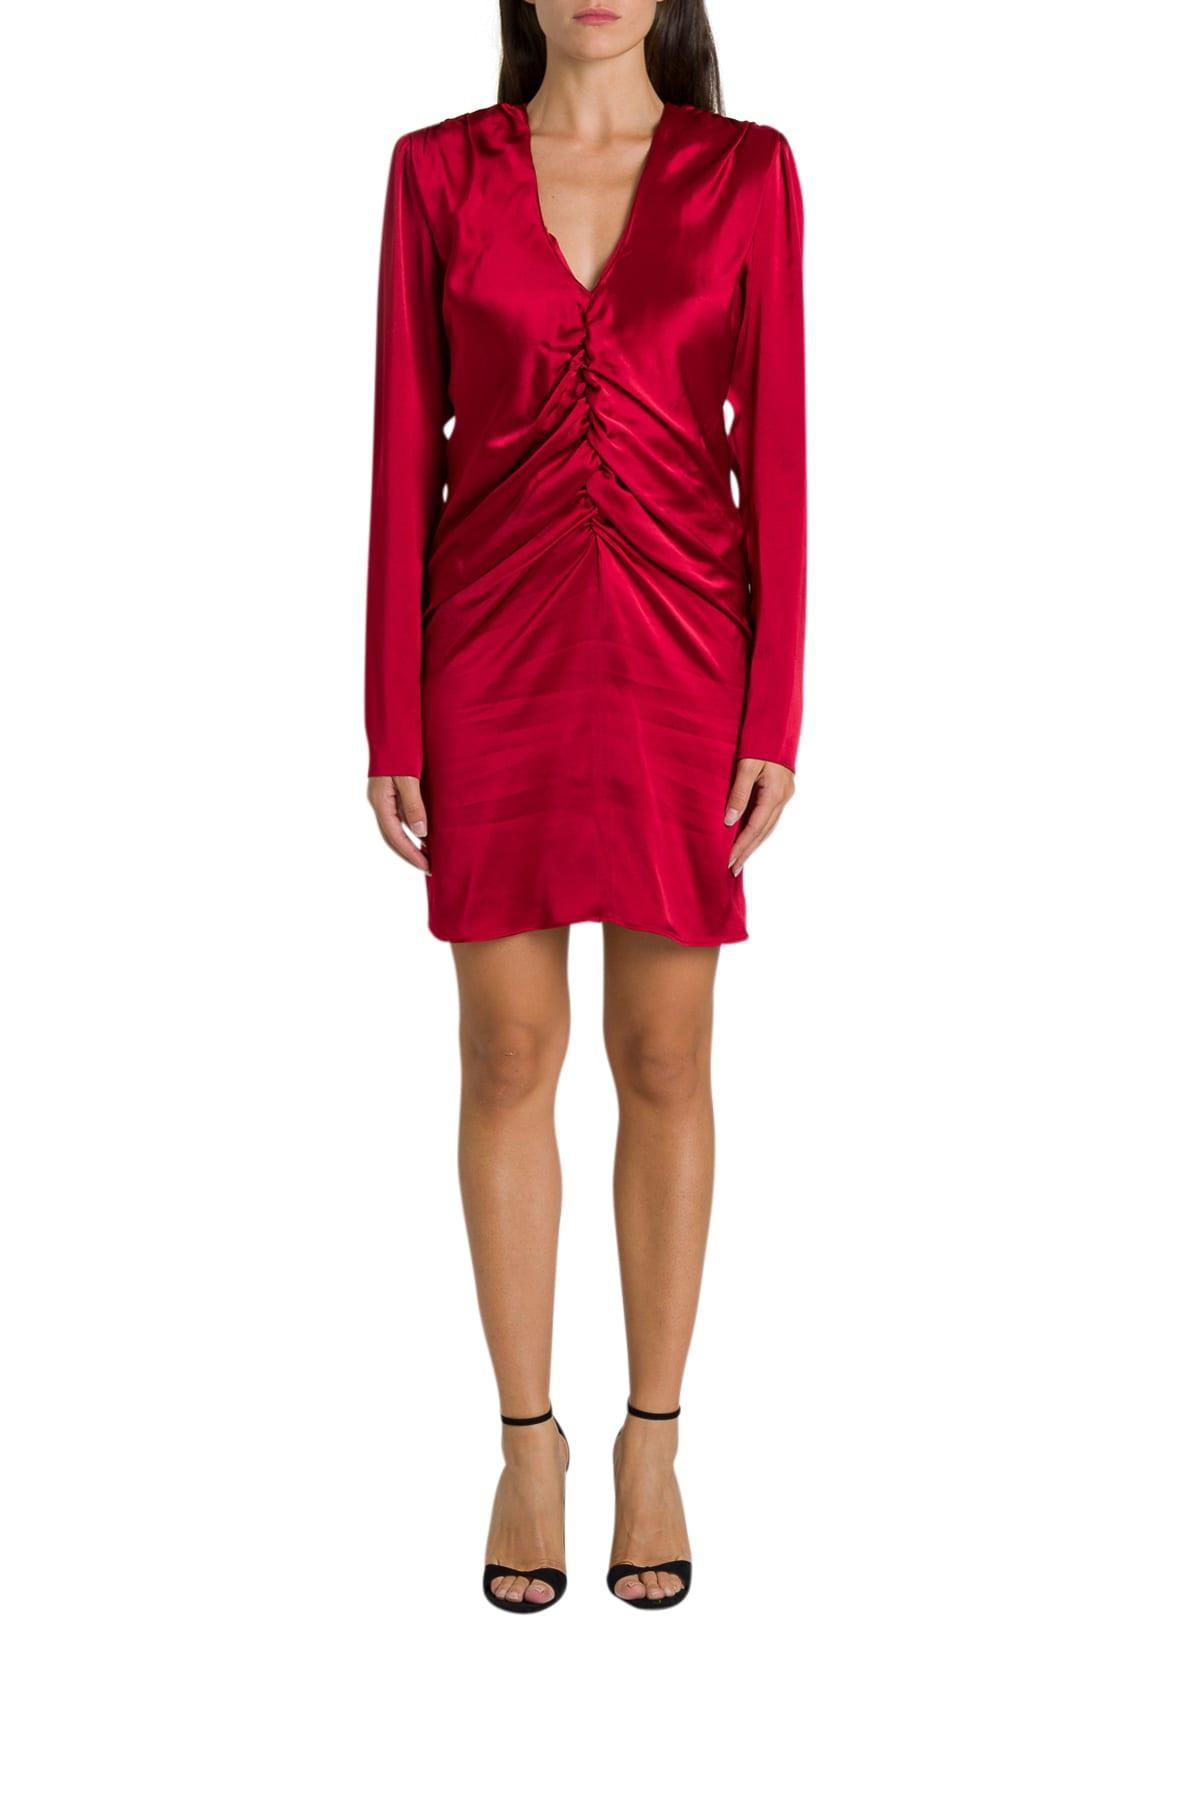 Federica Tosi Draped Silk Short Dress